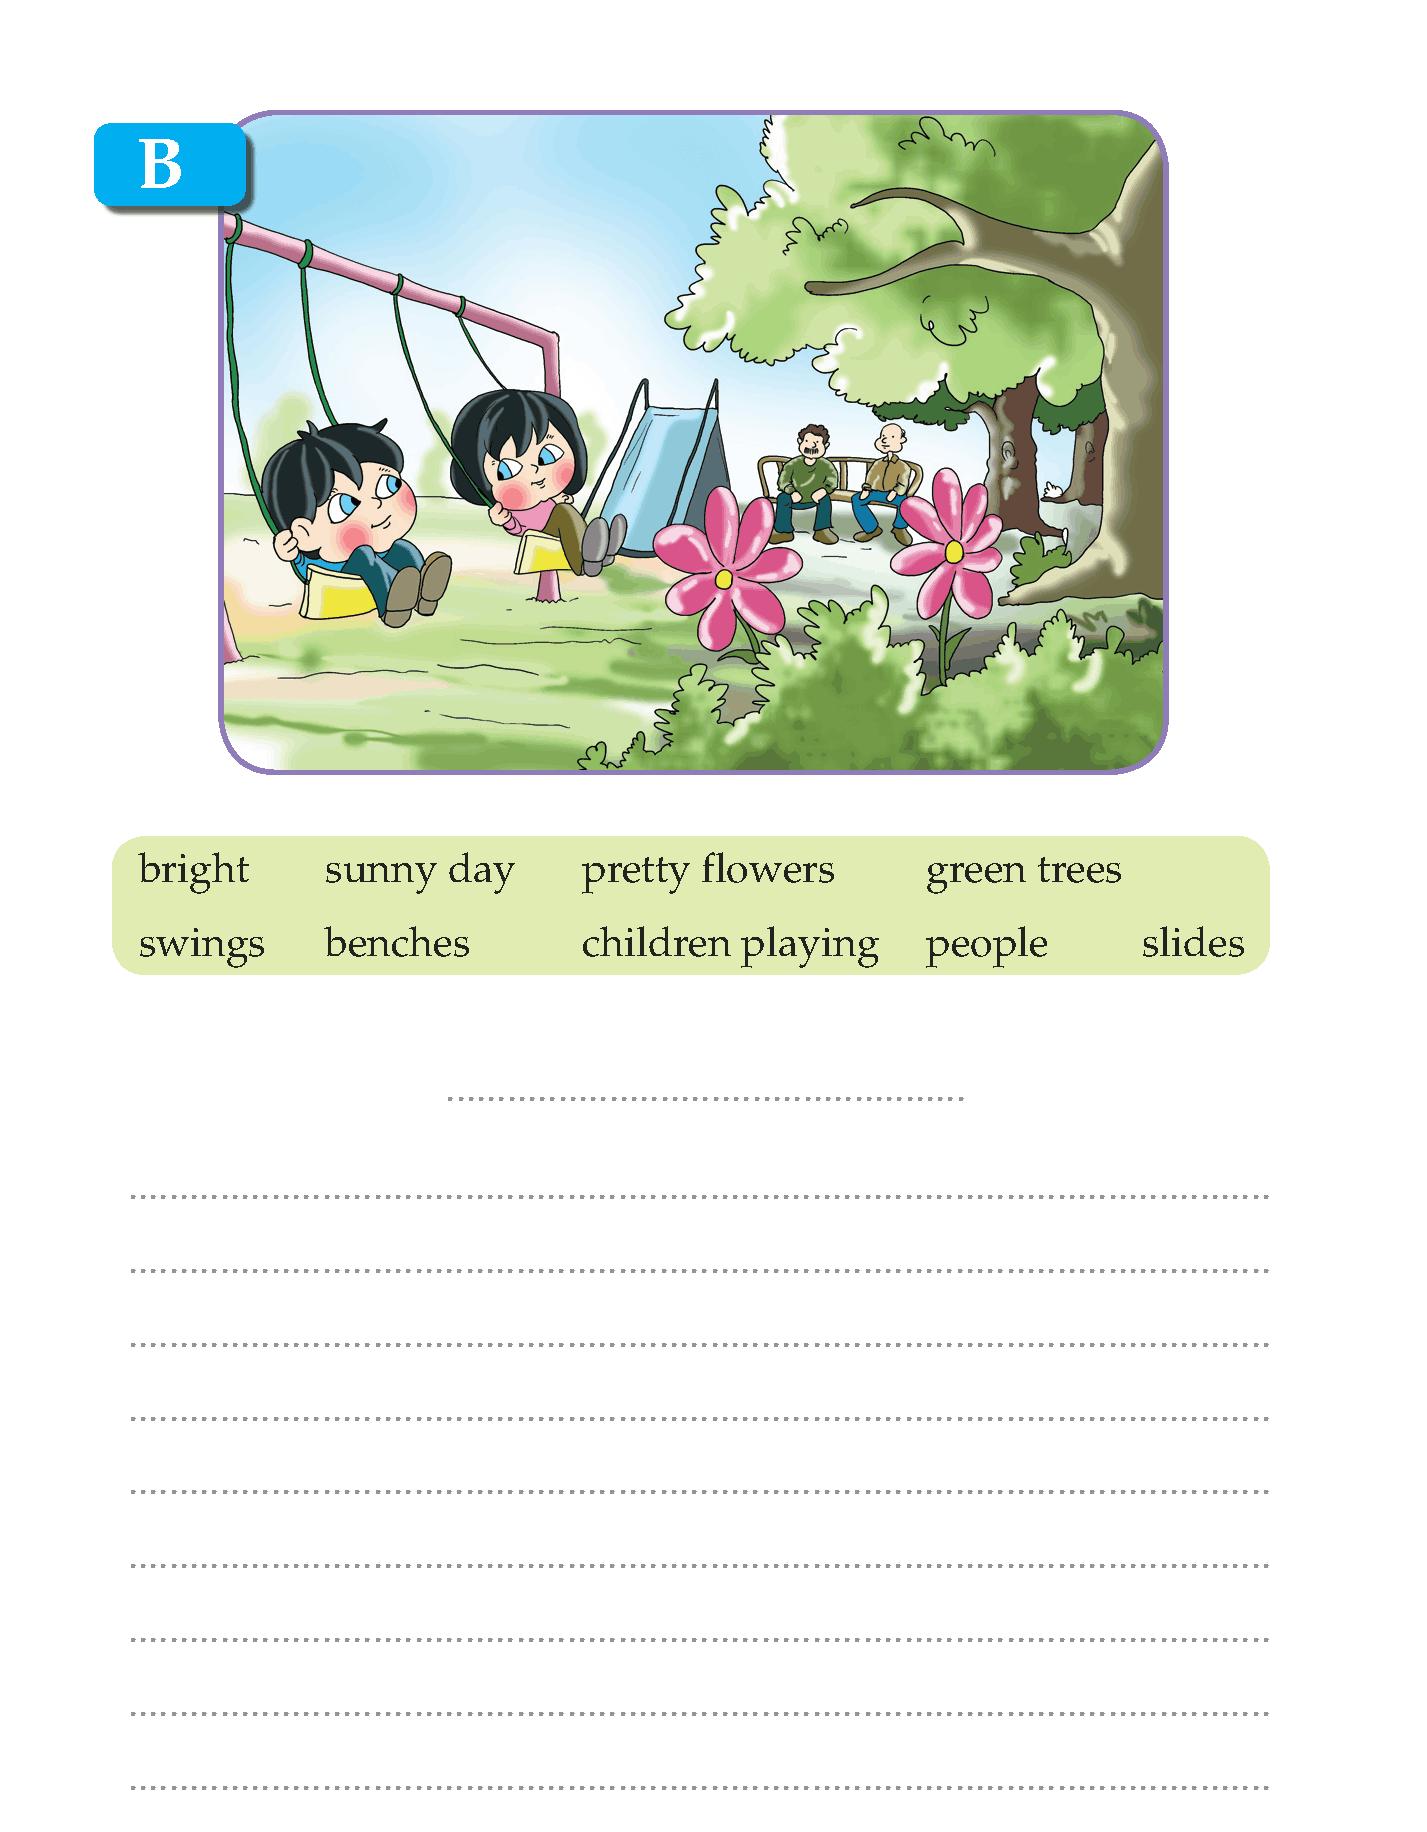 medium resolution of Writing skill -grade 3 - picture composition (4)   English writing skills